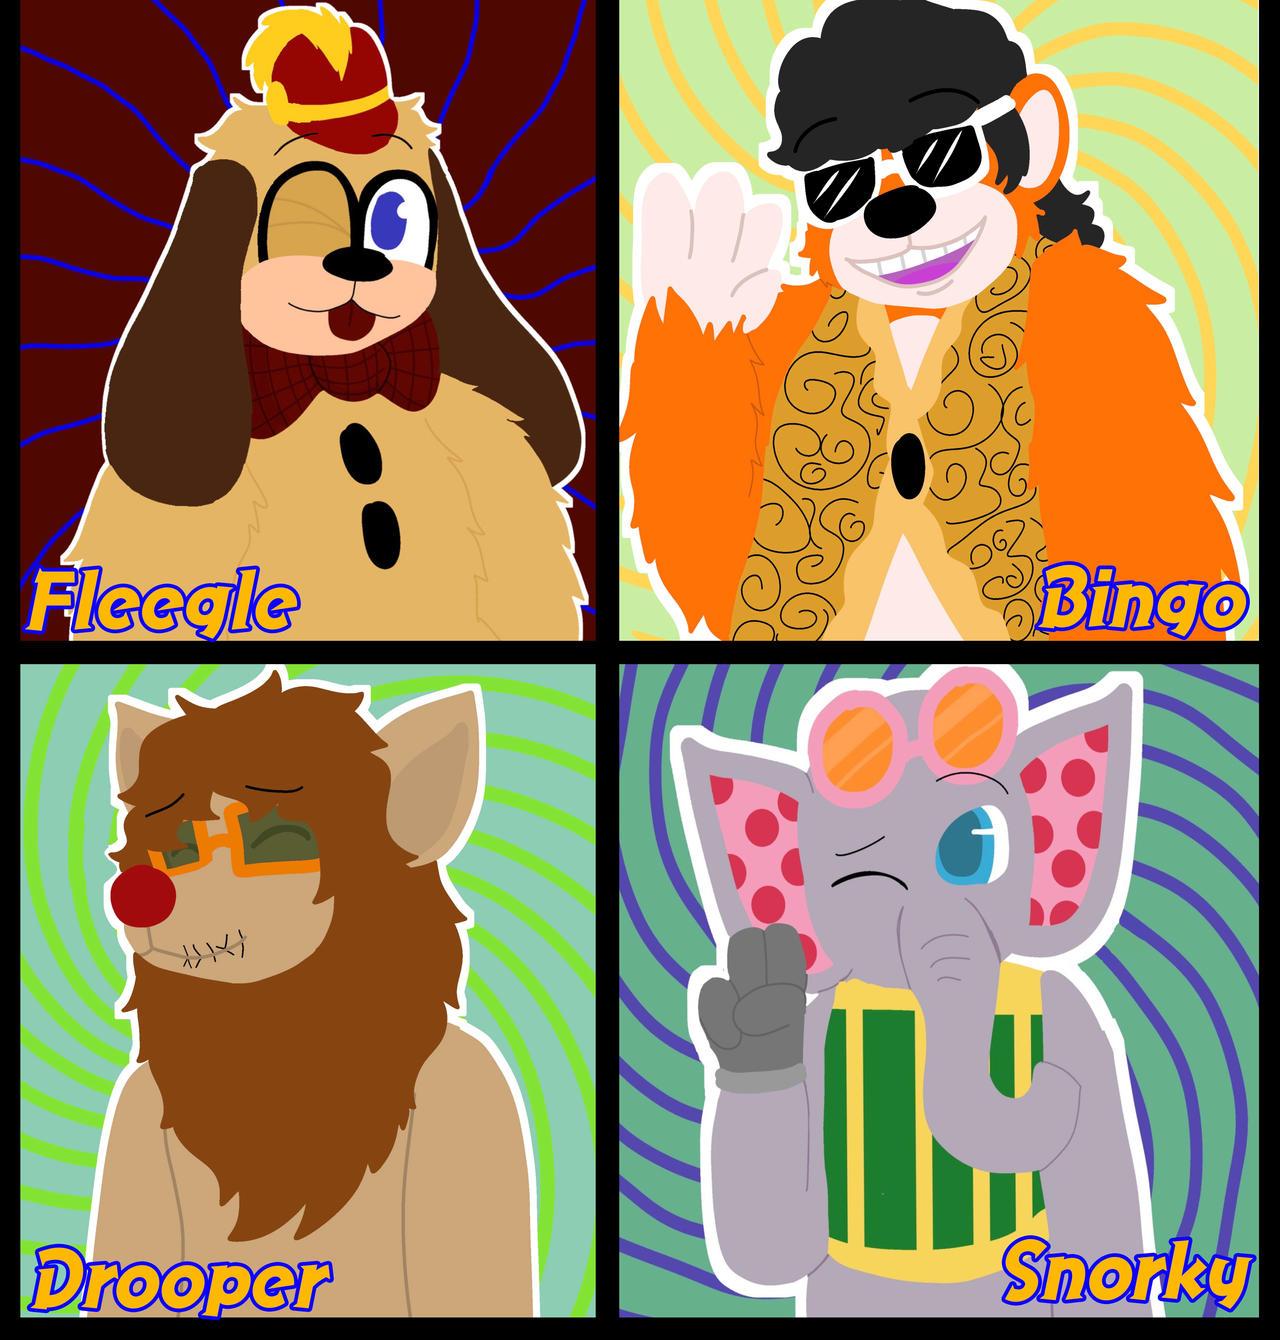 Amazon.com: Funko Tra La La Pop Fleegle, Bingo, Drooper and Stormy Vinyl  4-Pack Banana Splits Sid and Marty Krofft TV Show Retro Figure Colelctibles  Exclusive SDCC '60s Hanna-Barbera Series: Toys & Games